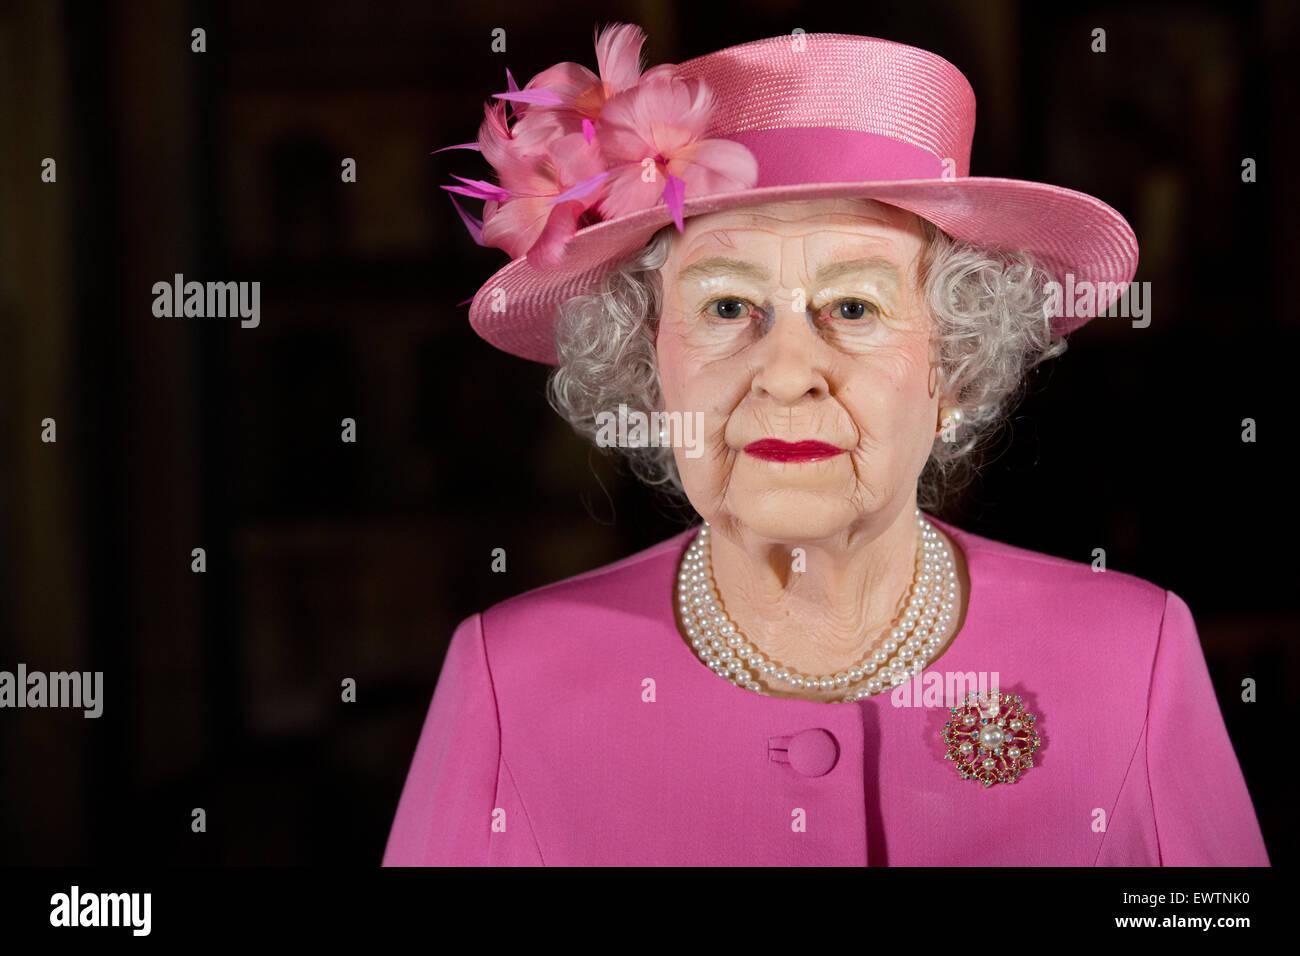 Hamburg, Germany. 01st July, 2015. A wax figure of Britain's Queen Elizabeth II is presented at Panoptikum in - Stock Image